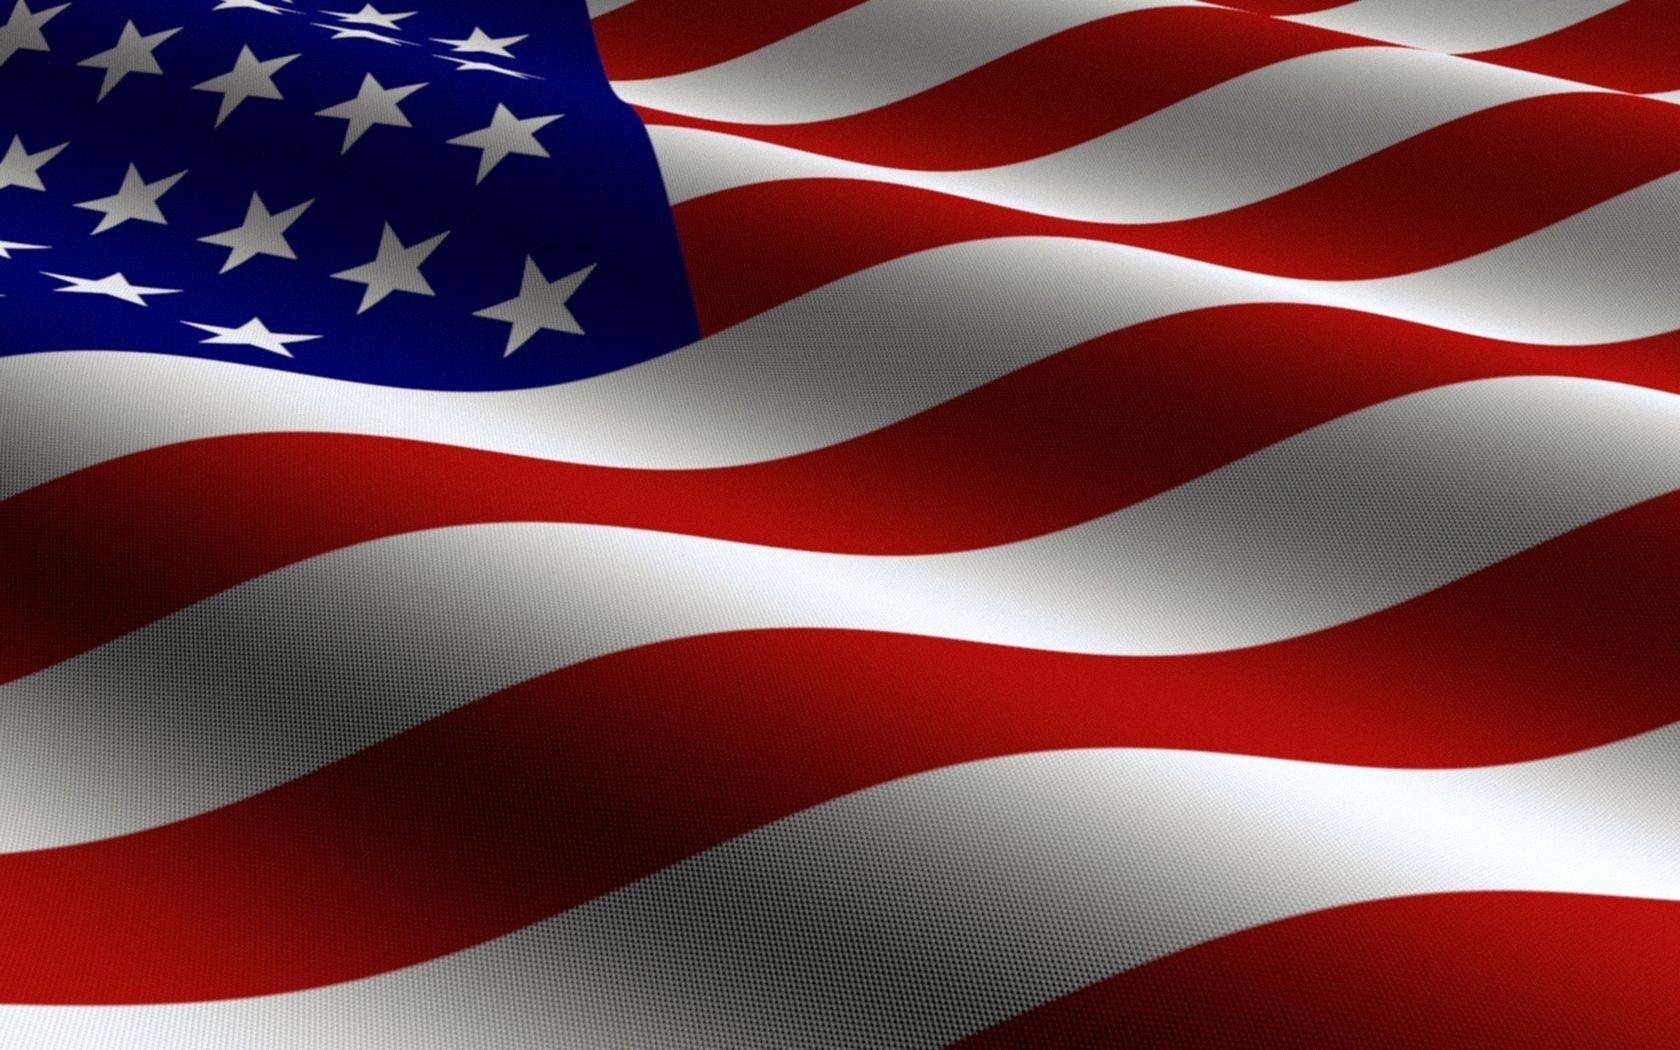 38554 Заставки и Обои Флаги на телефон. Скачать Флаги, Фон картинки бесплатно